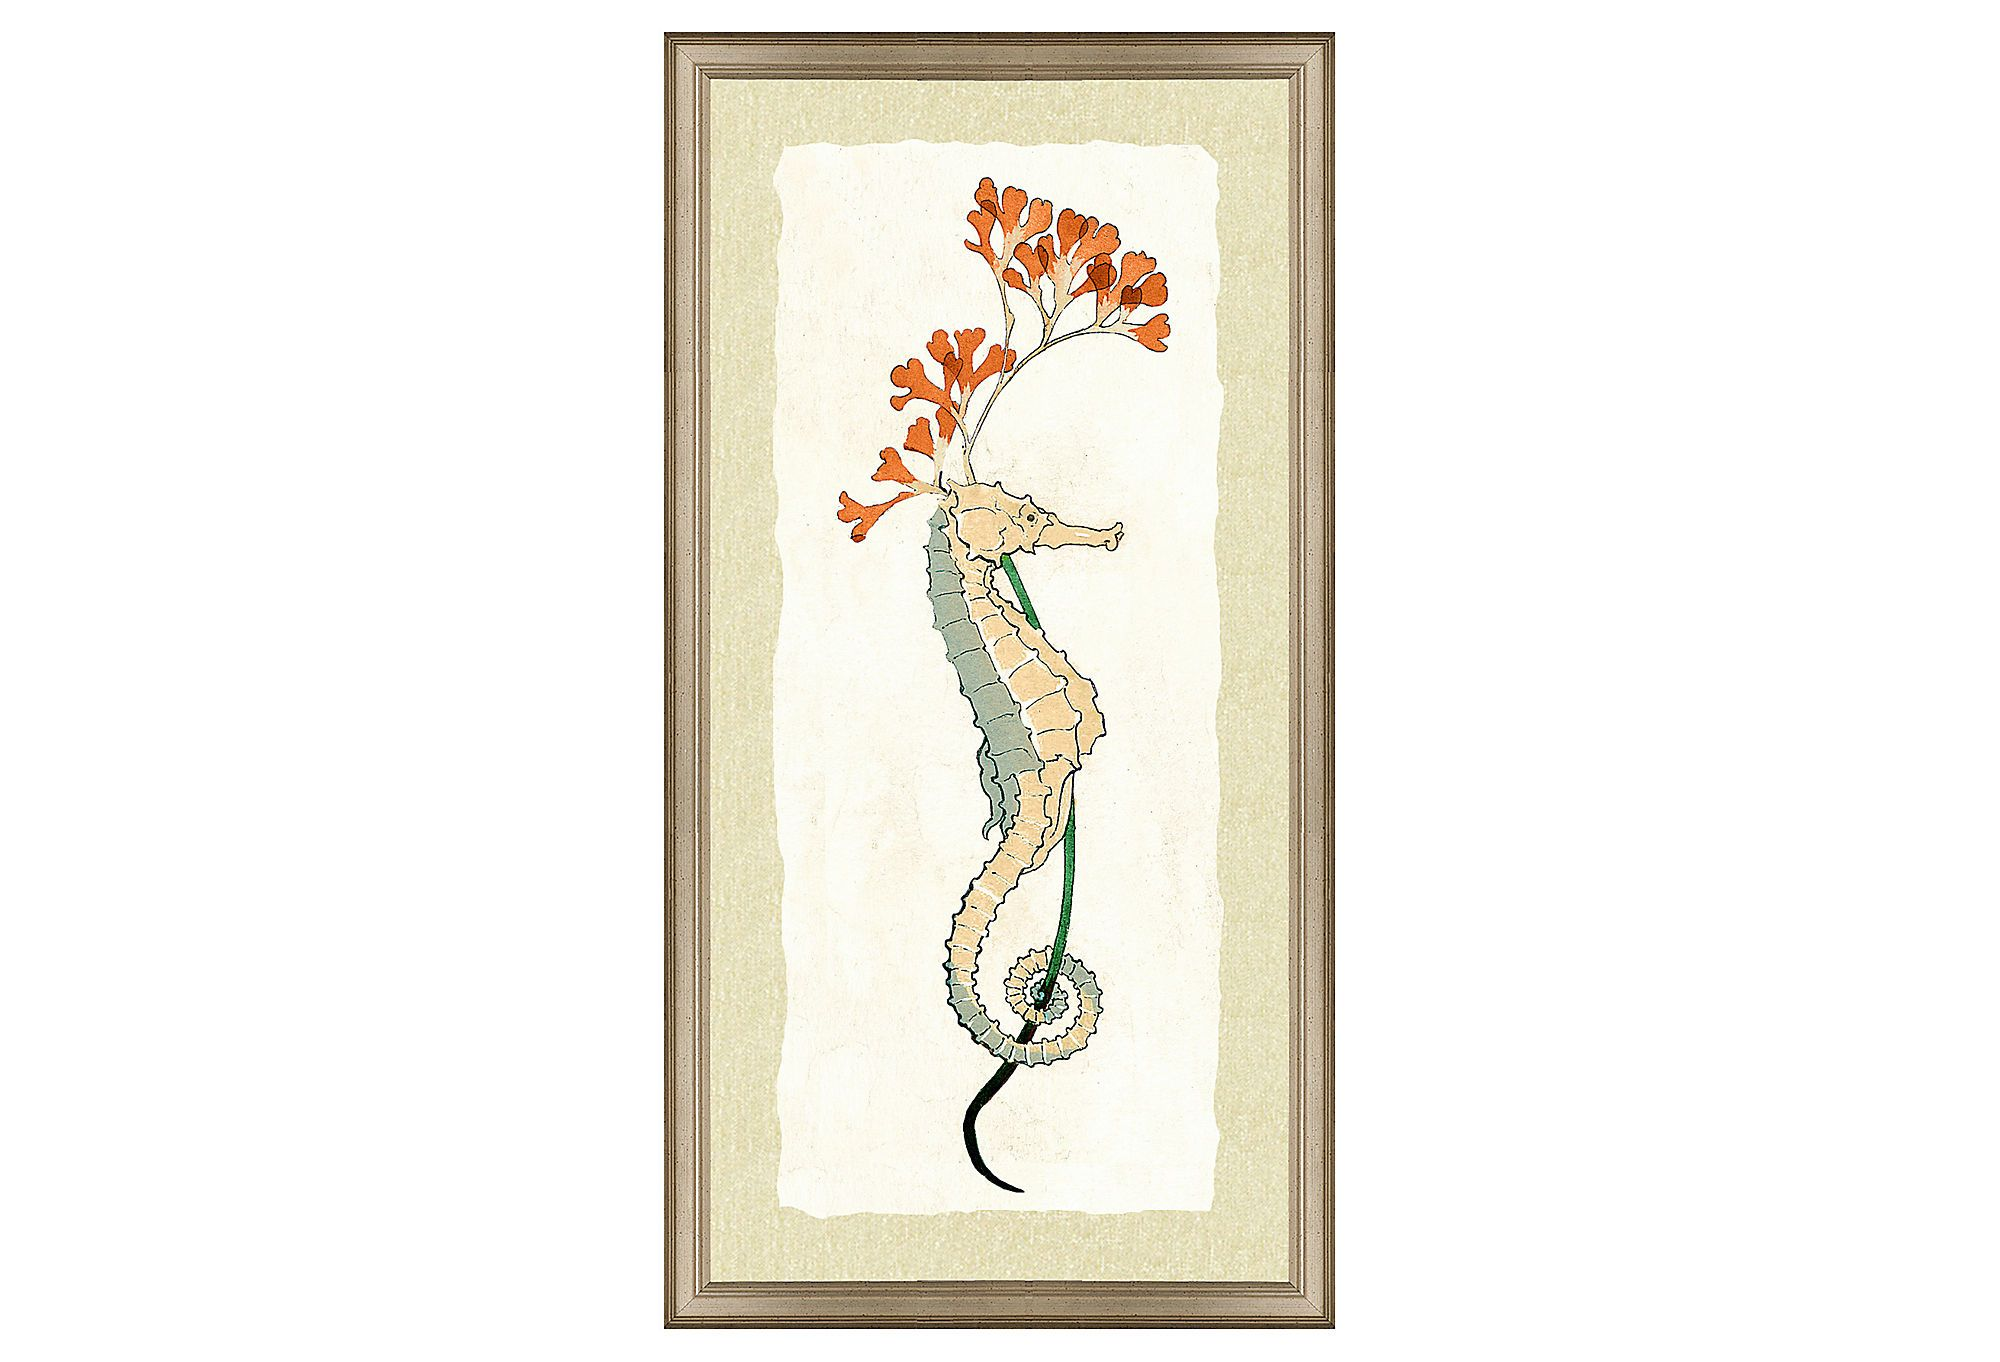 One Kings Lane - Island Living - Teal Seahorse Print II